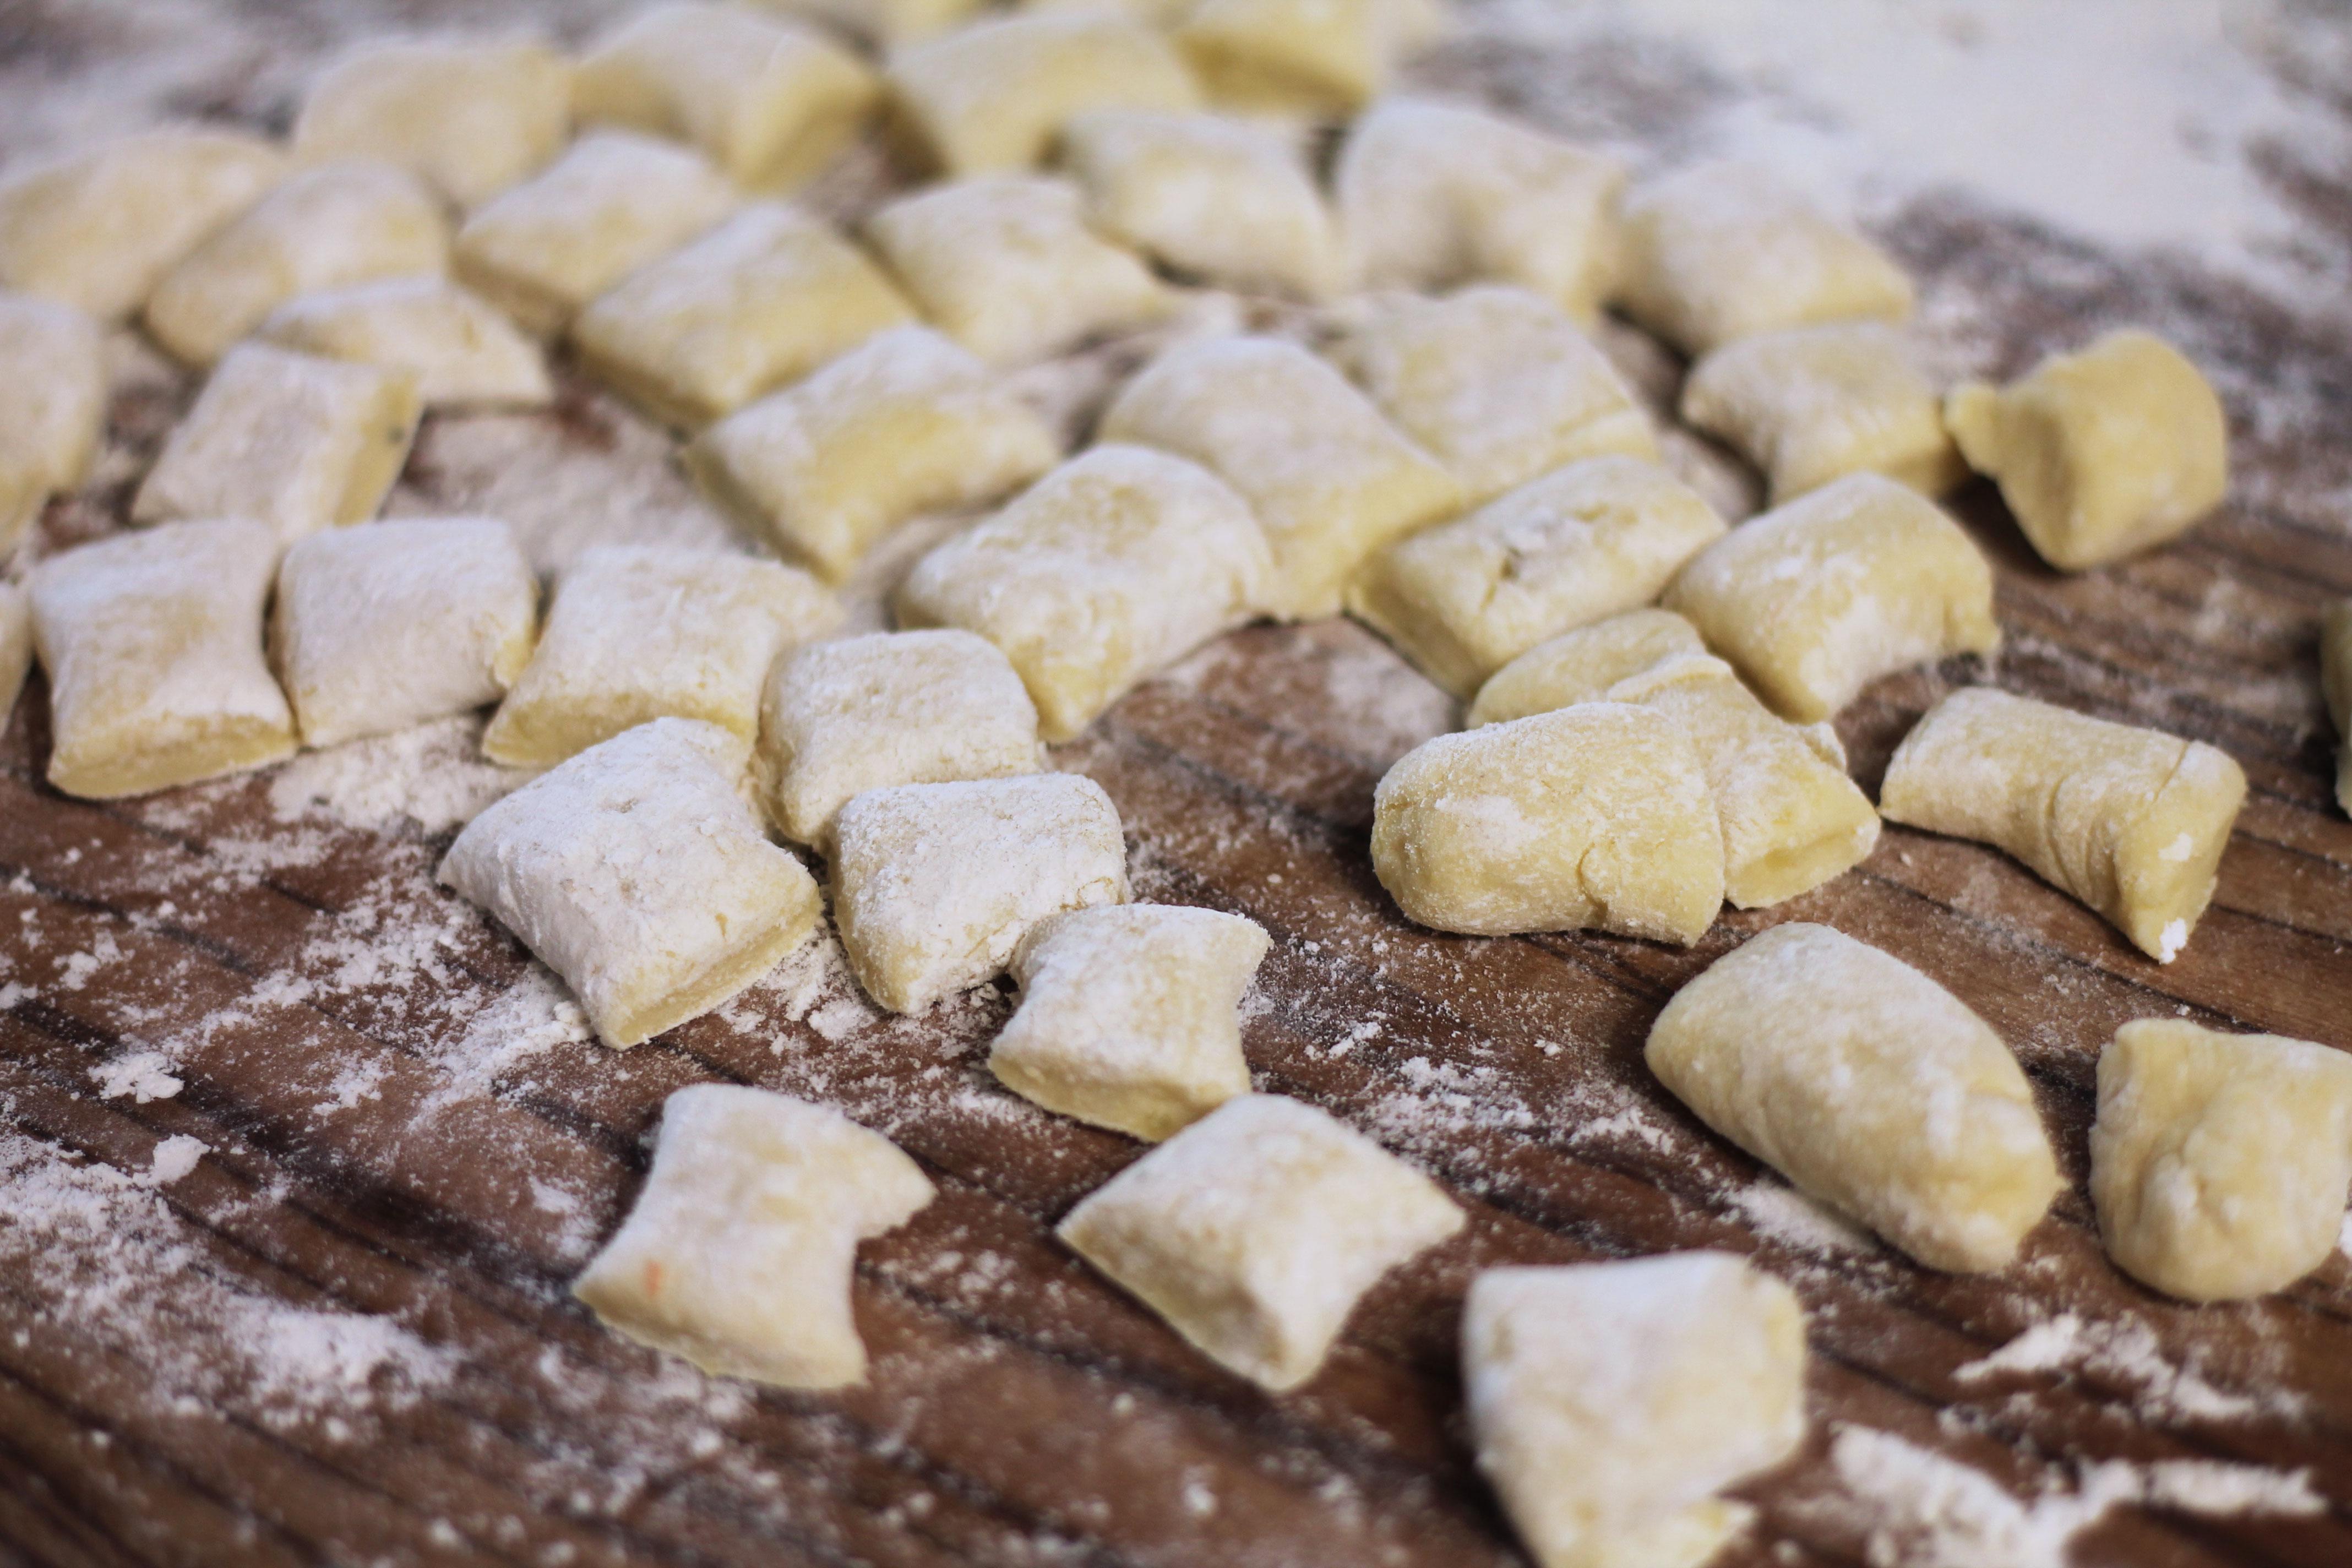 7-geschmackswelten-food-blogparade-italien-kulinarische-momente-italia-italy-rezept-gericht-kardiaserena-gnocchi